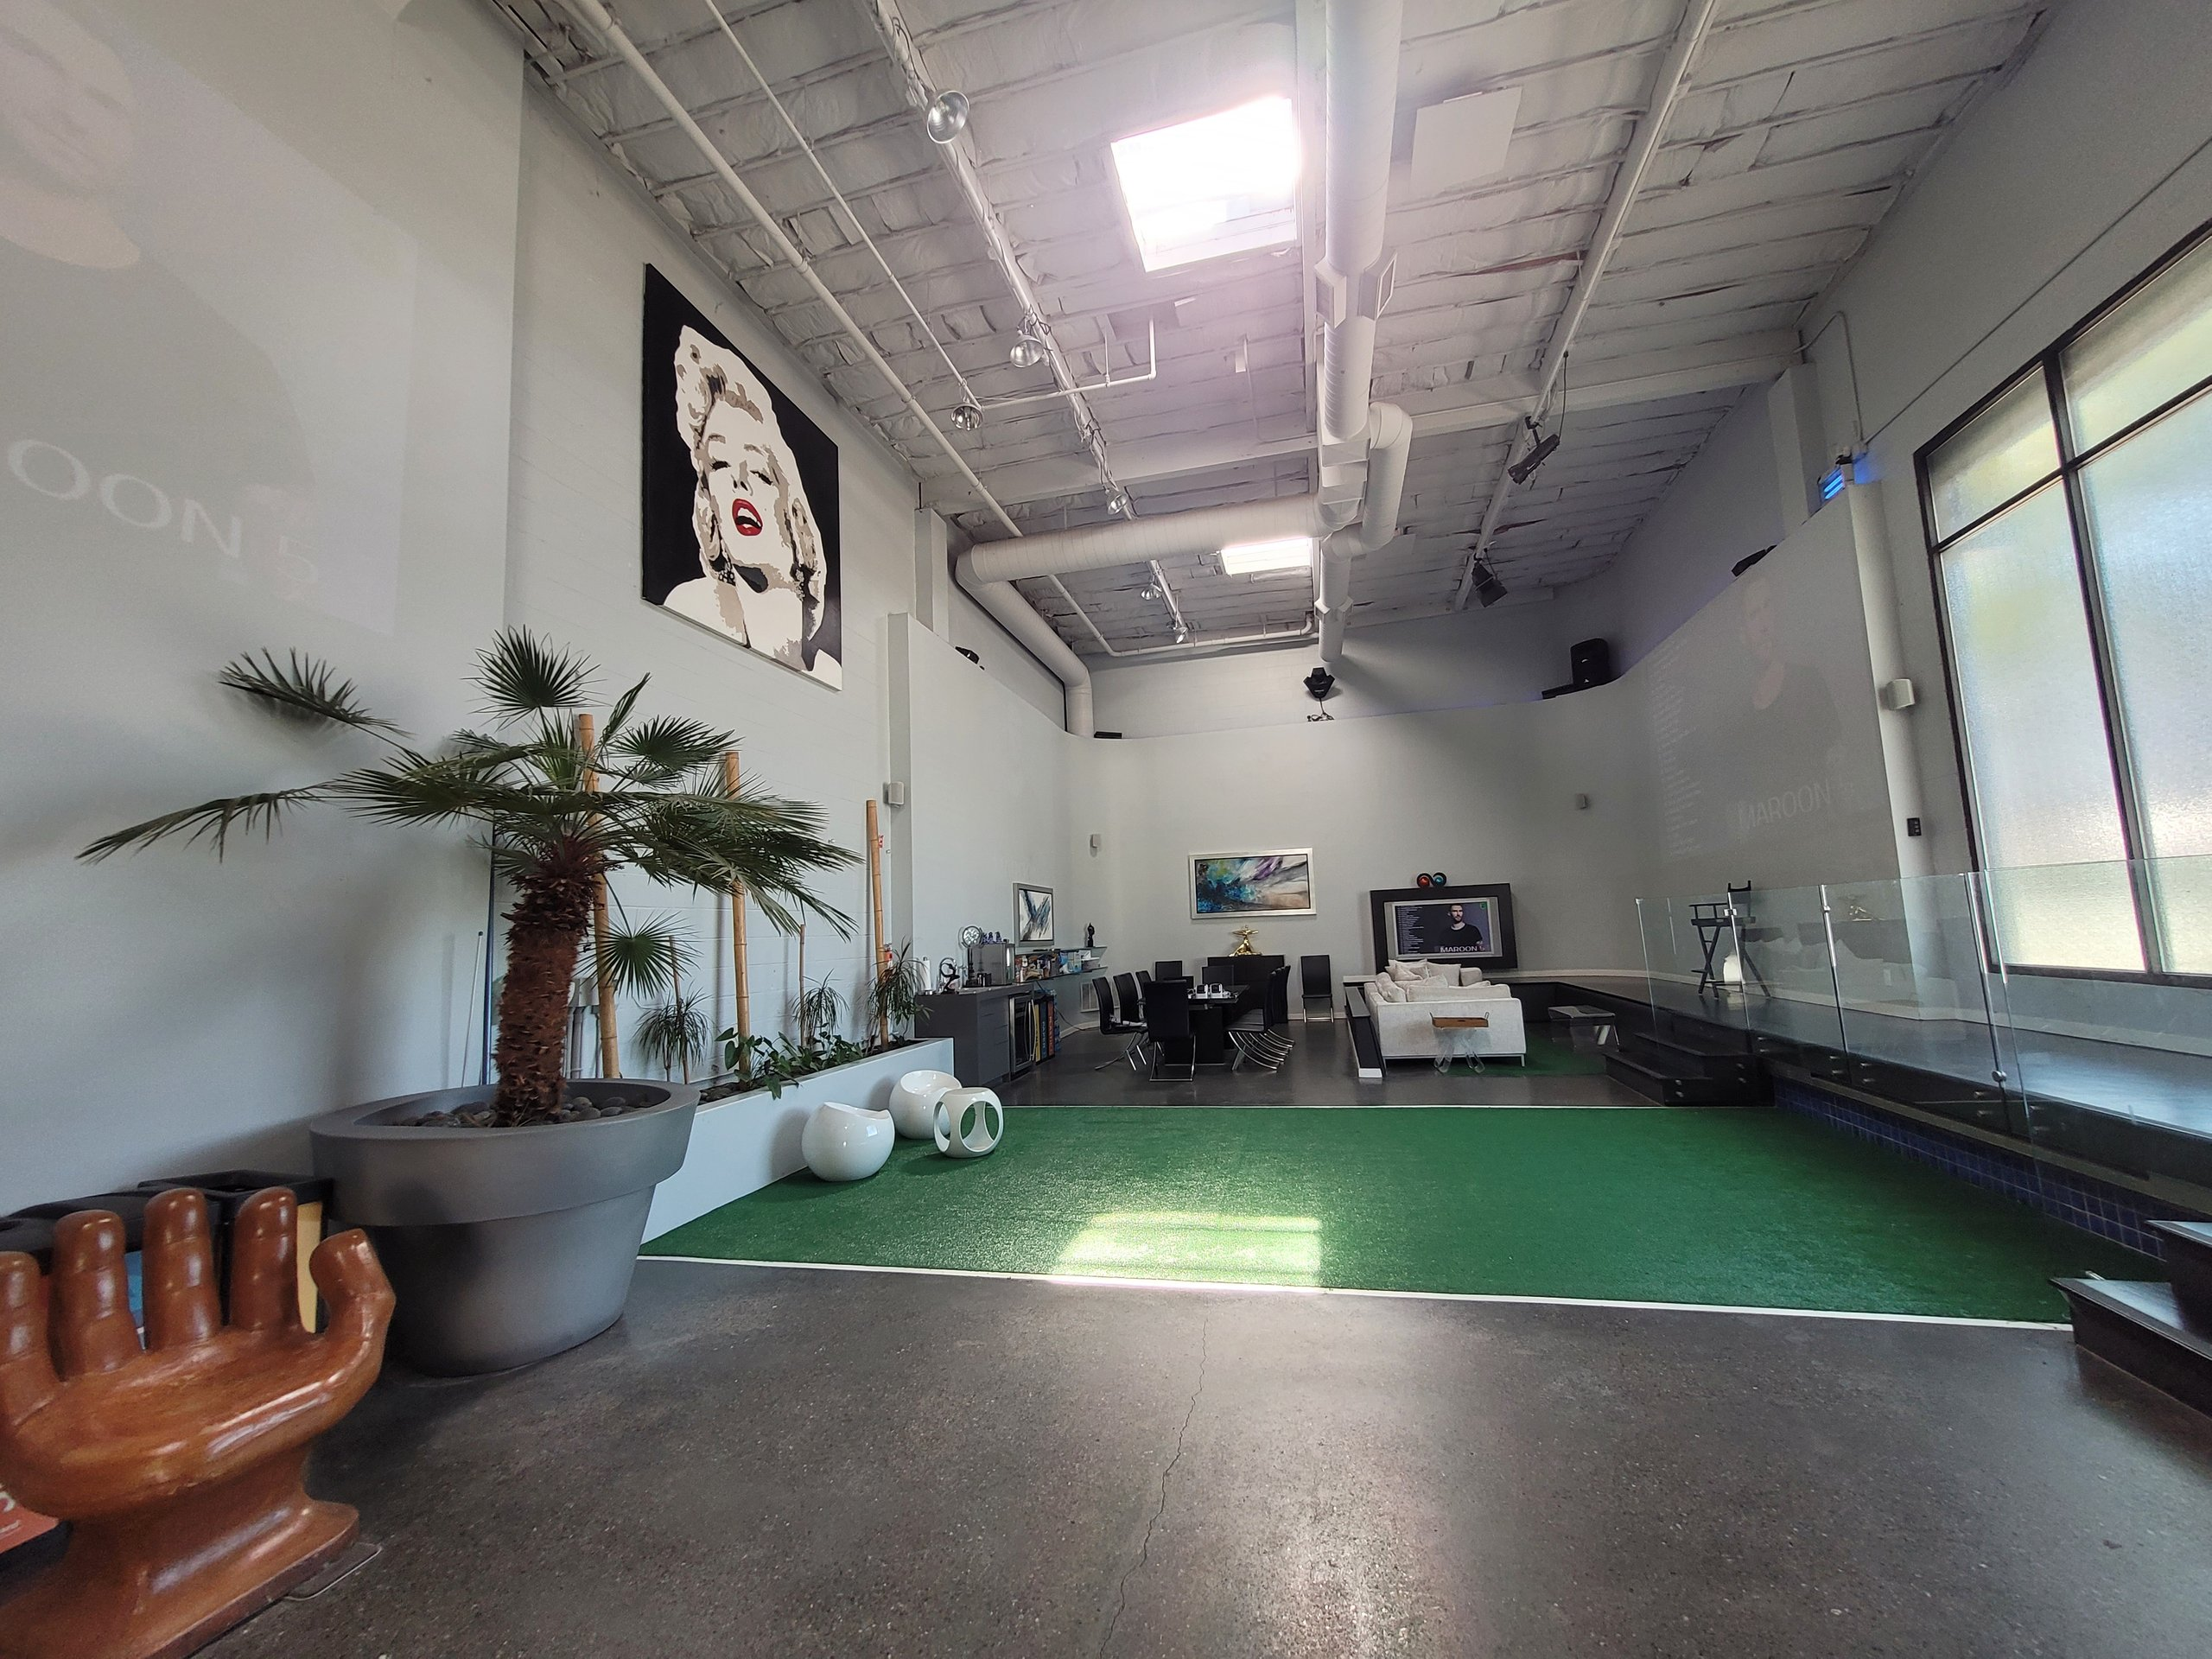 51x27 Warehouse self storage unit